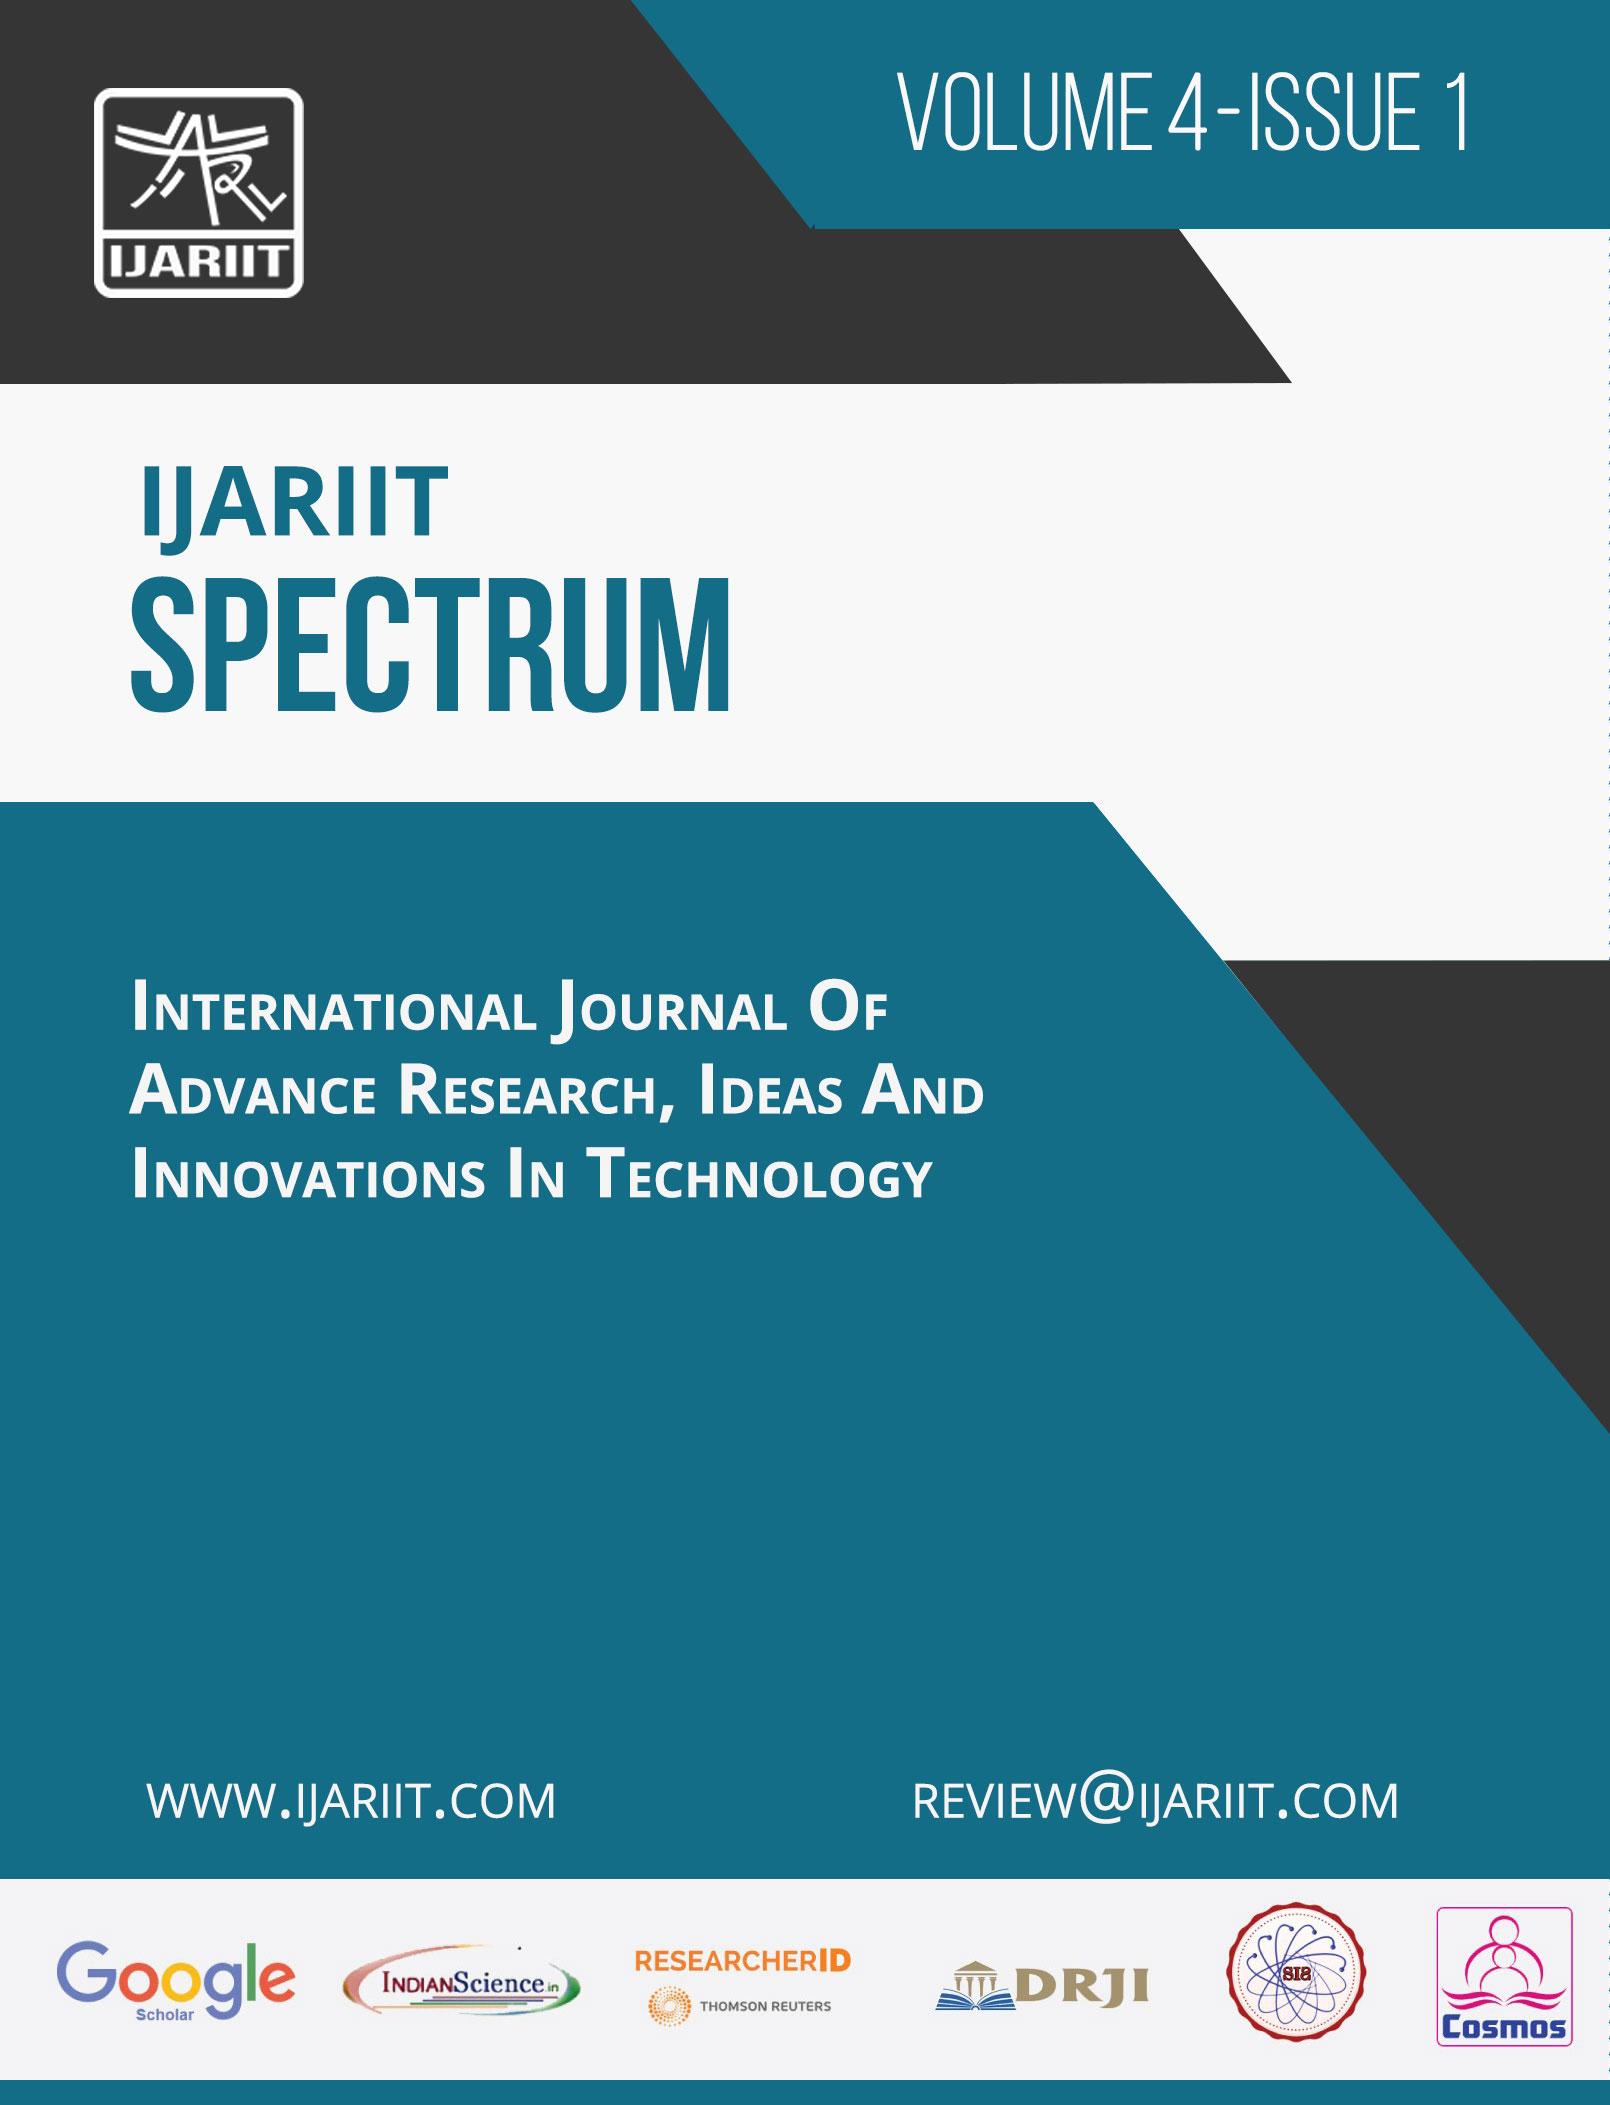 Edition: Volume-4, Issue-1 - IJARIIT